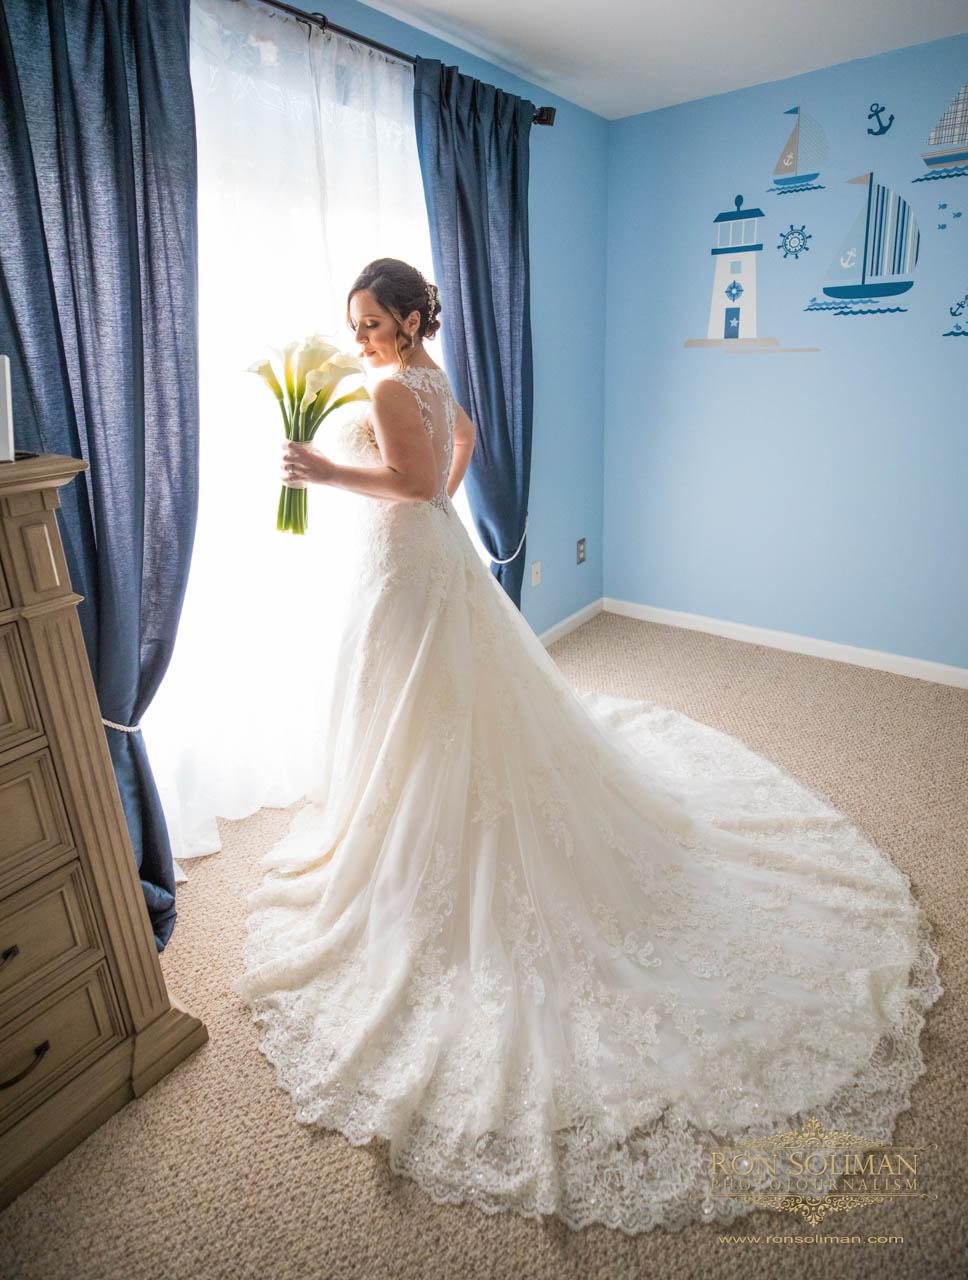 ADELPHIA RESTAURANT WEDDING 7